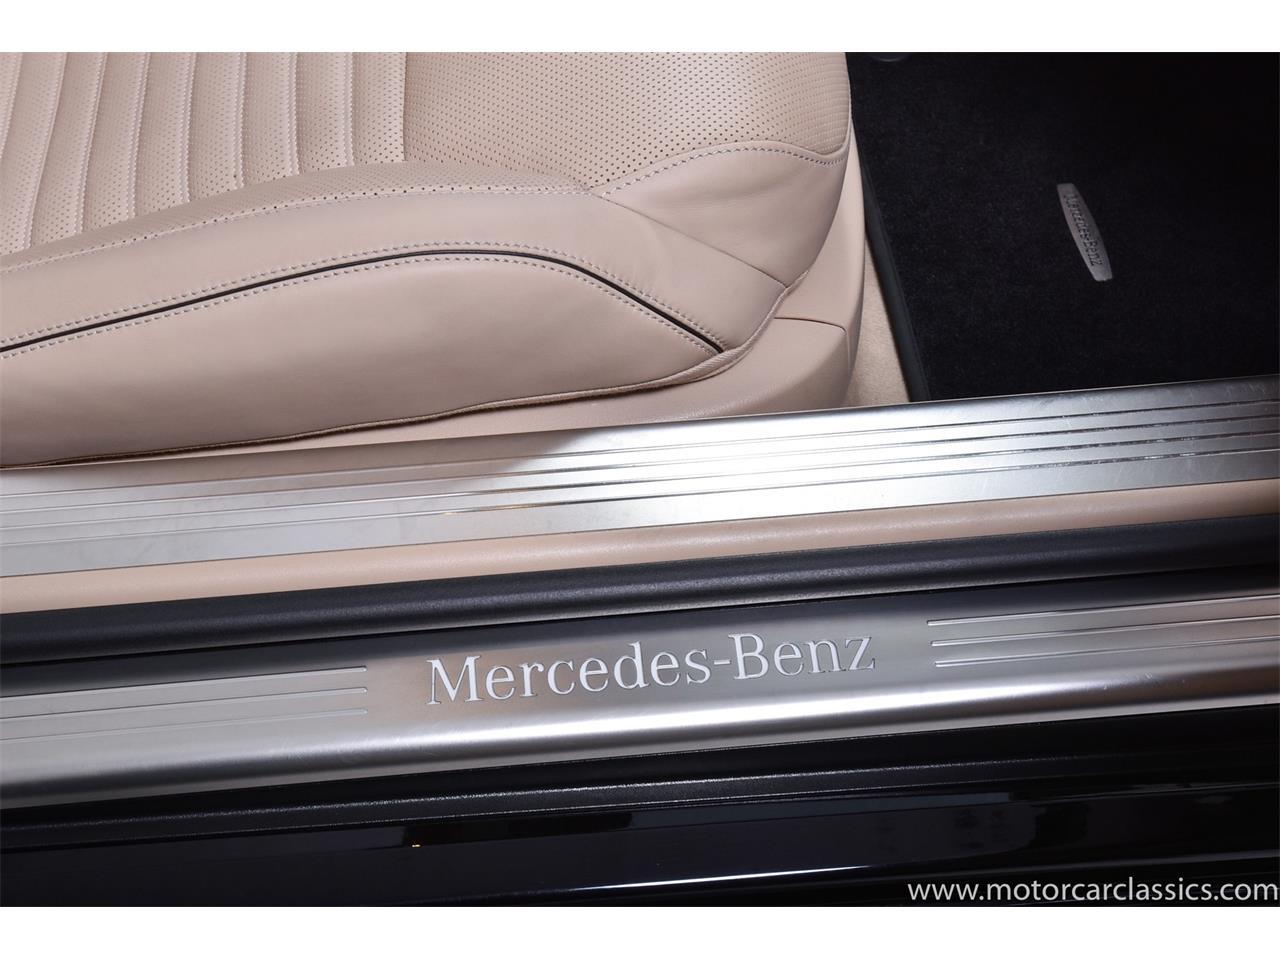 2013 Mercedes-Benz SL-Class (CC-1330596) for sale in Farmingdale, New York